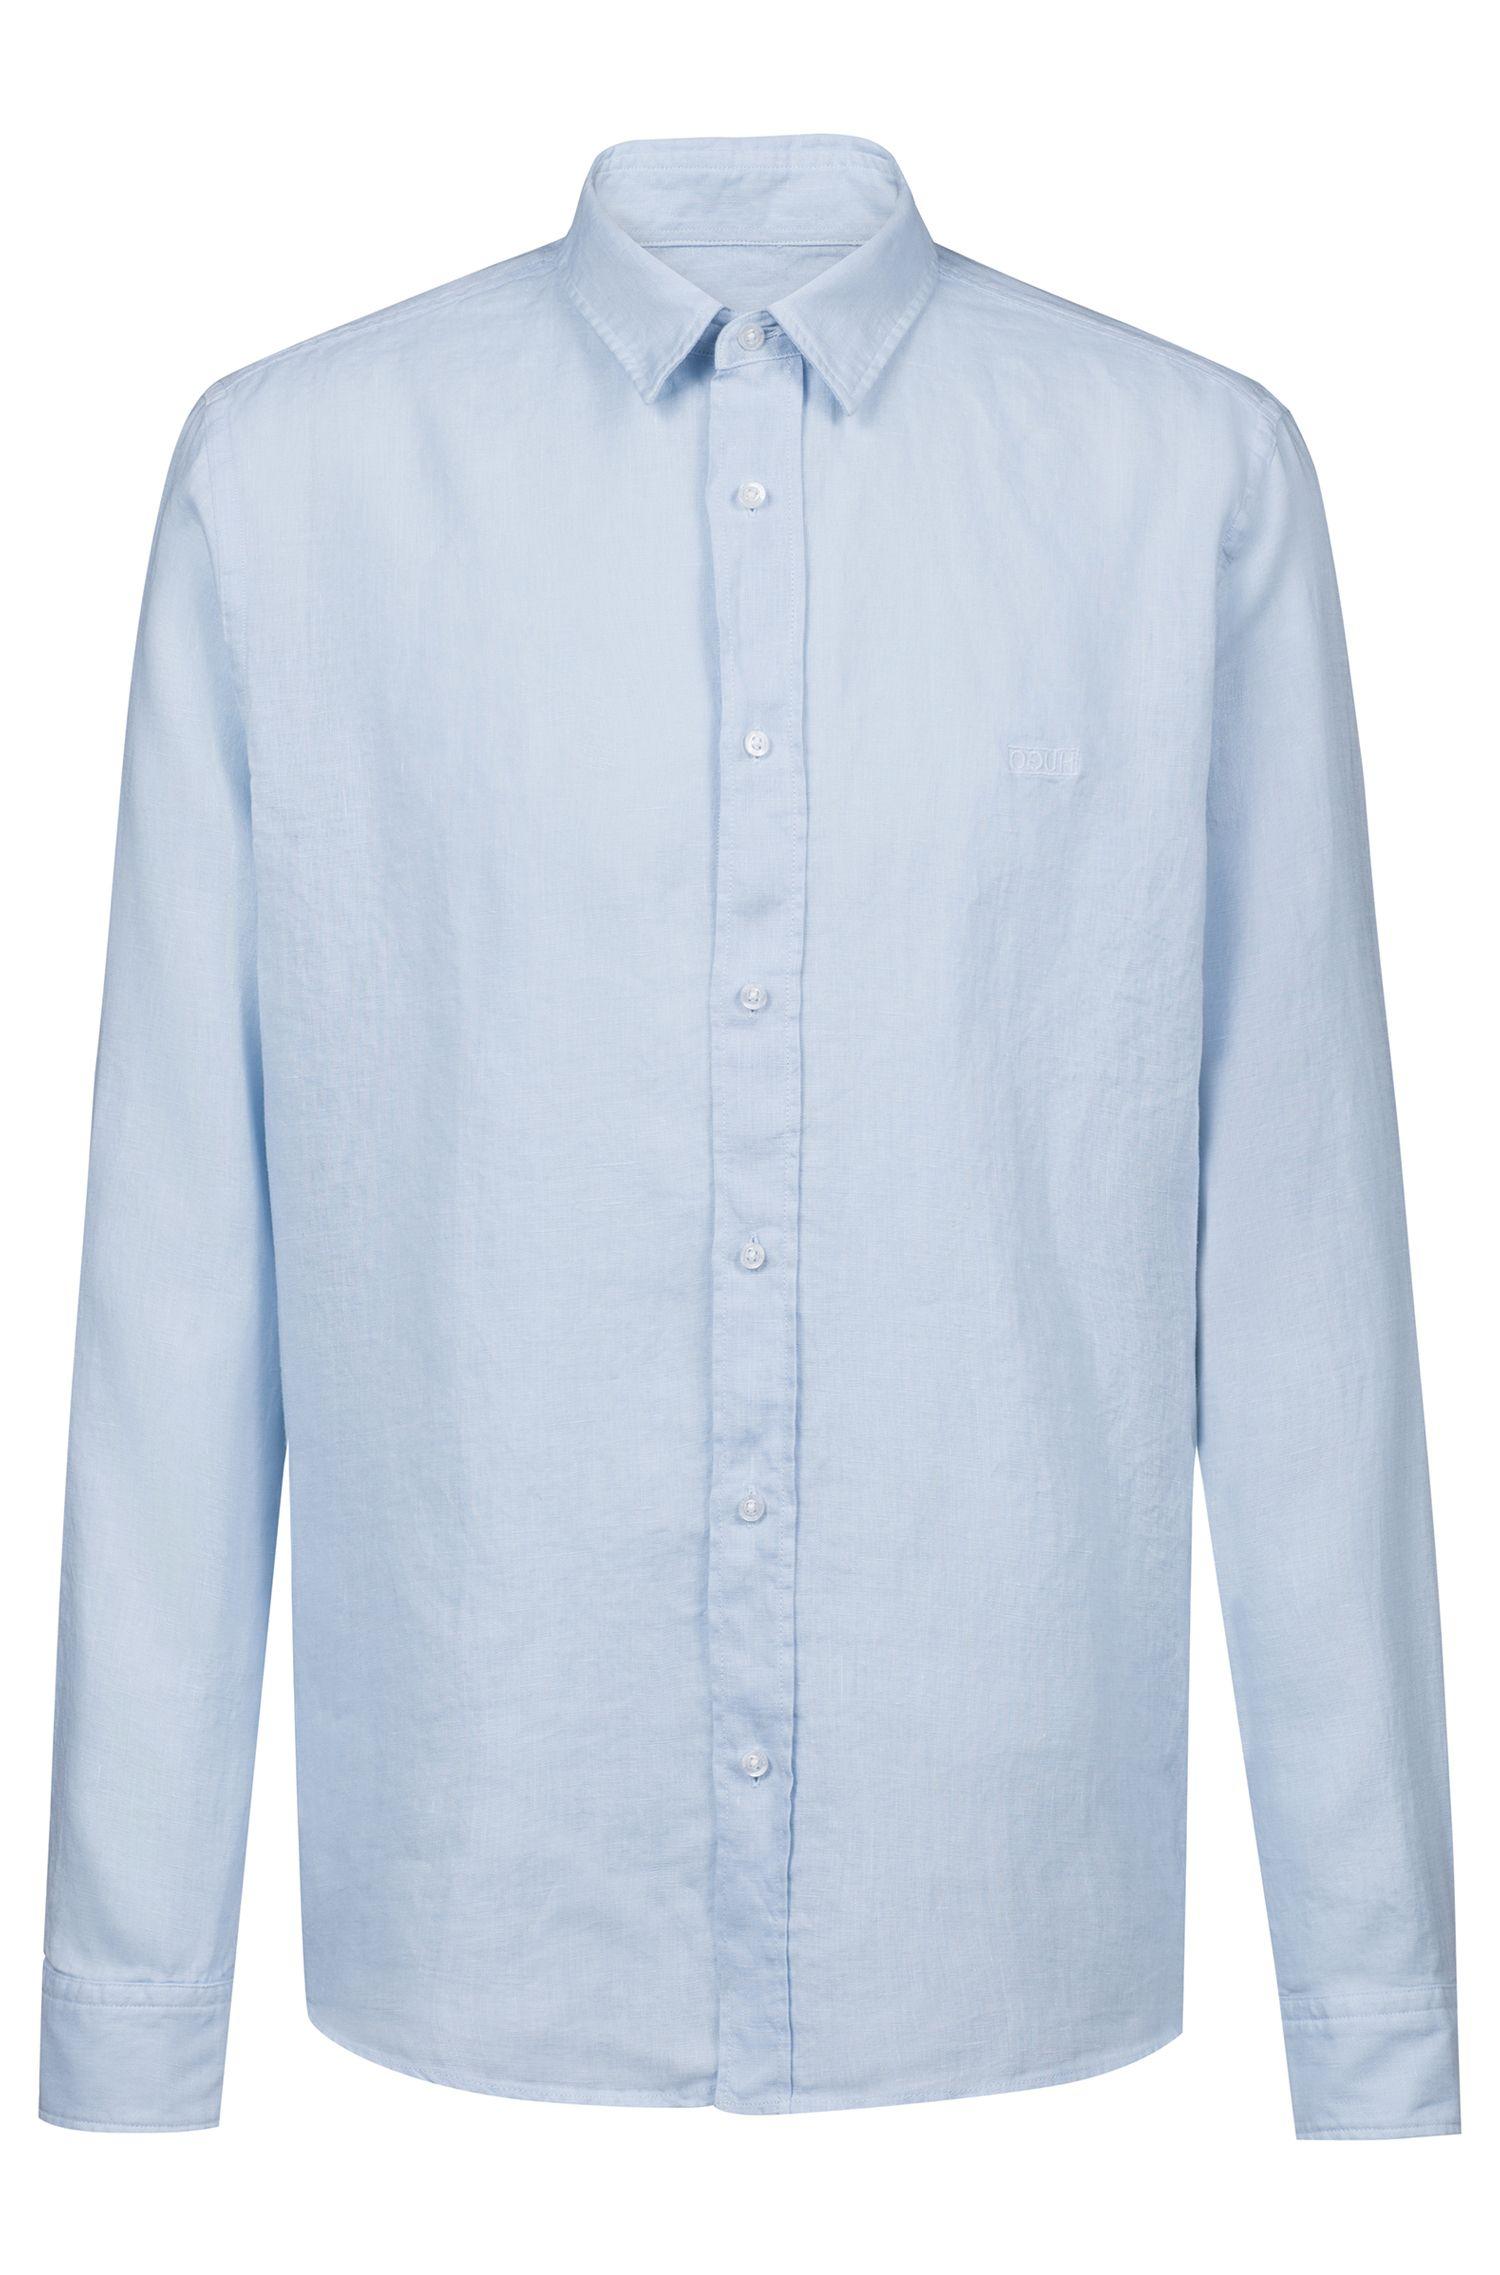 Relaxed-fit overhemd van linnen met gespiegeld logo, Lichtblauw